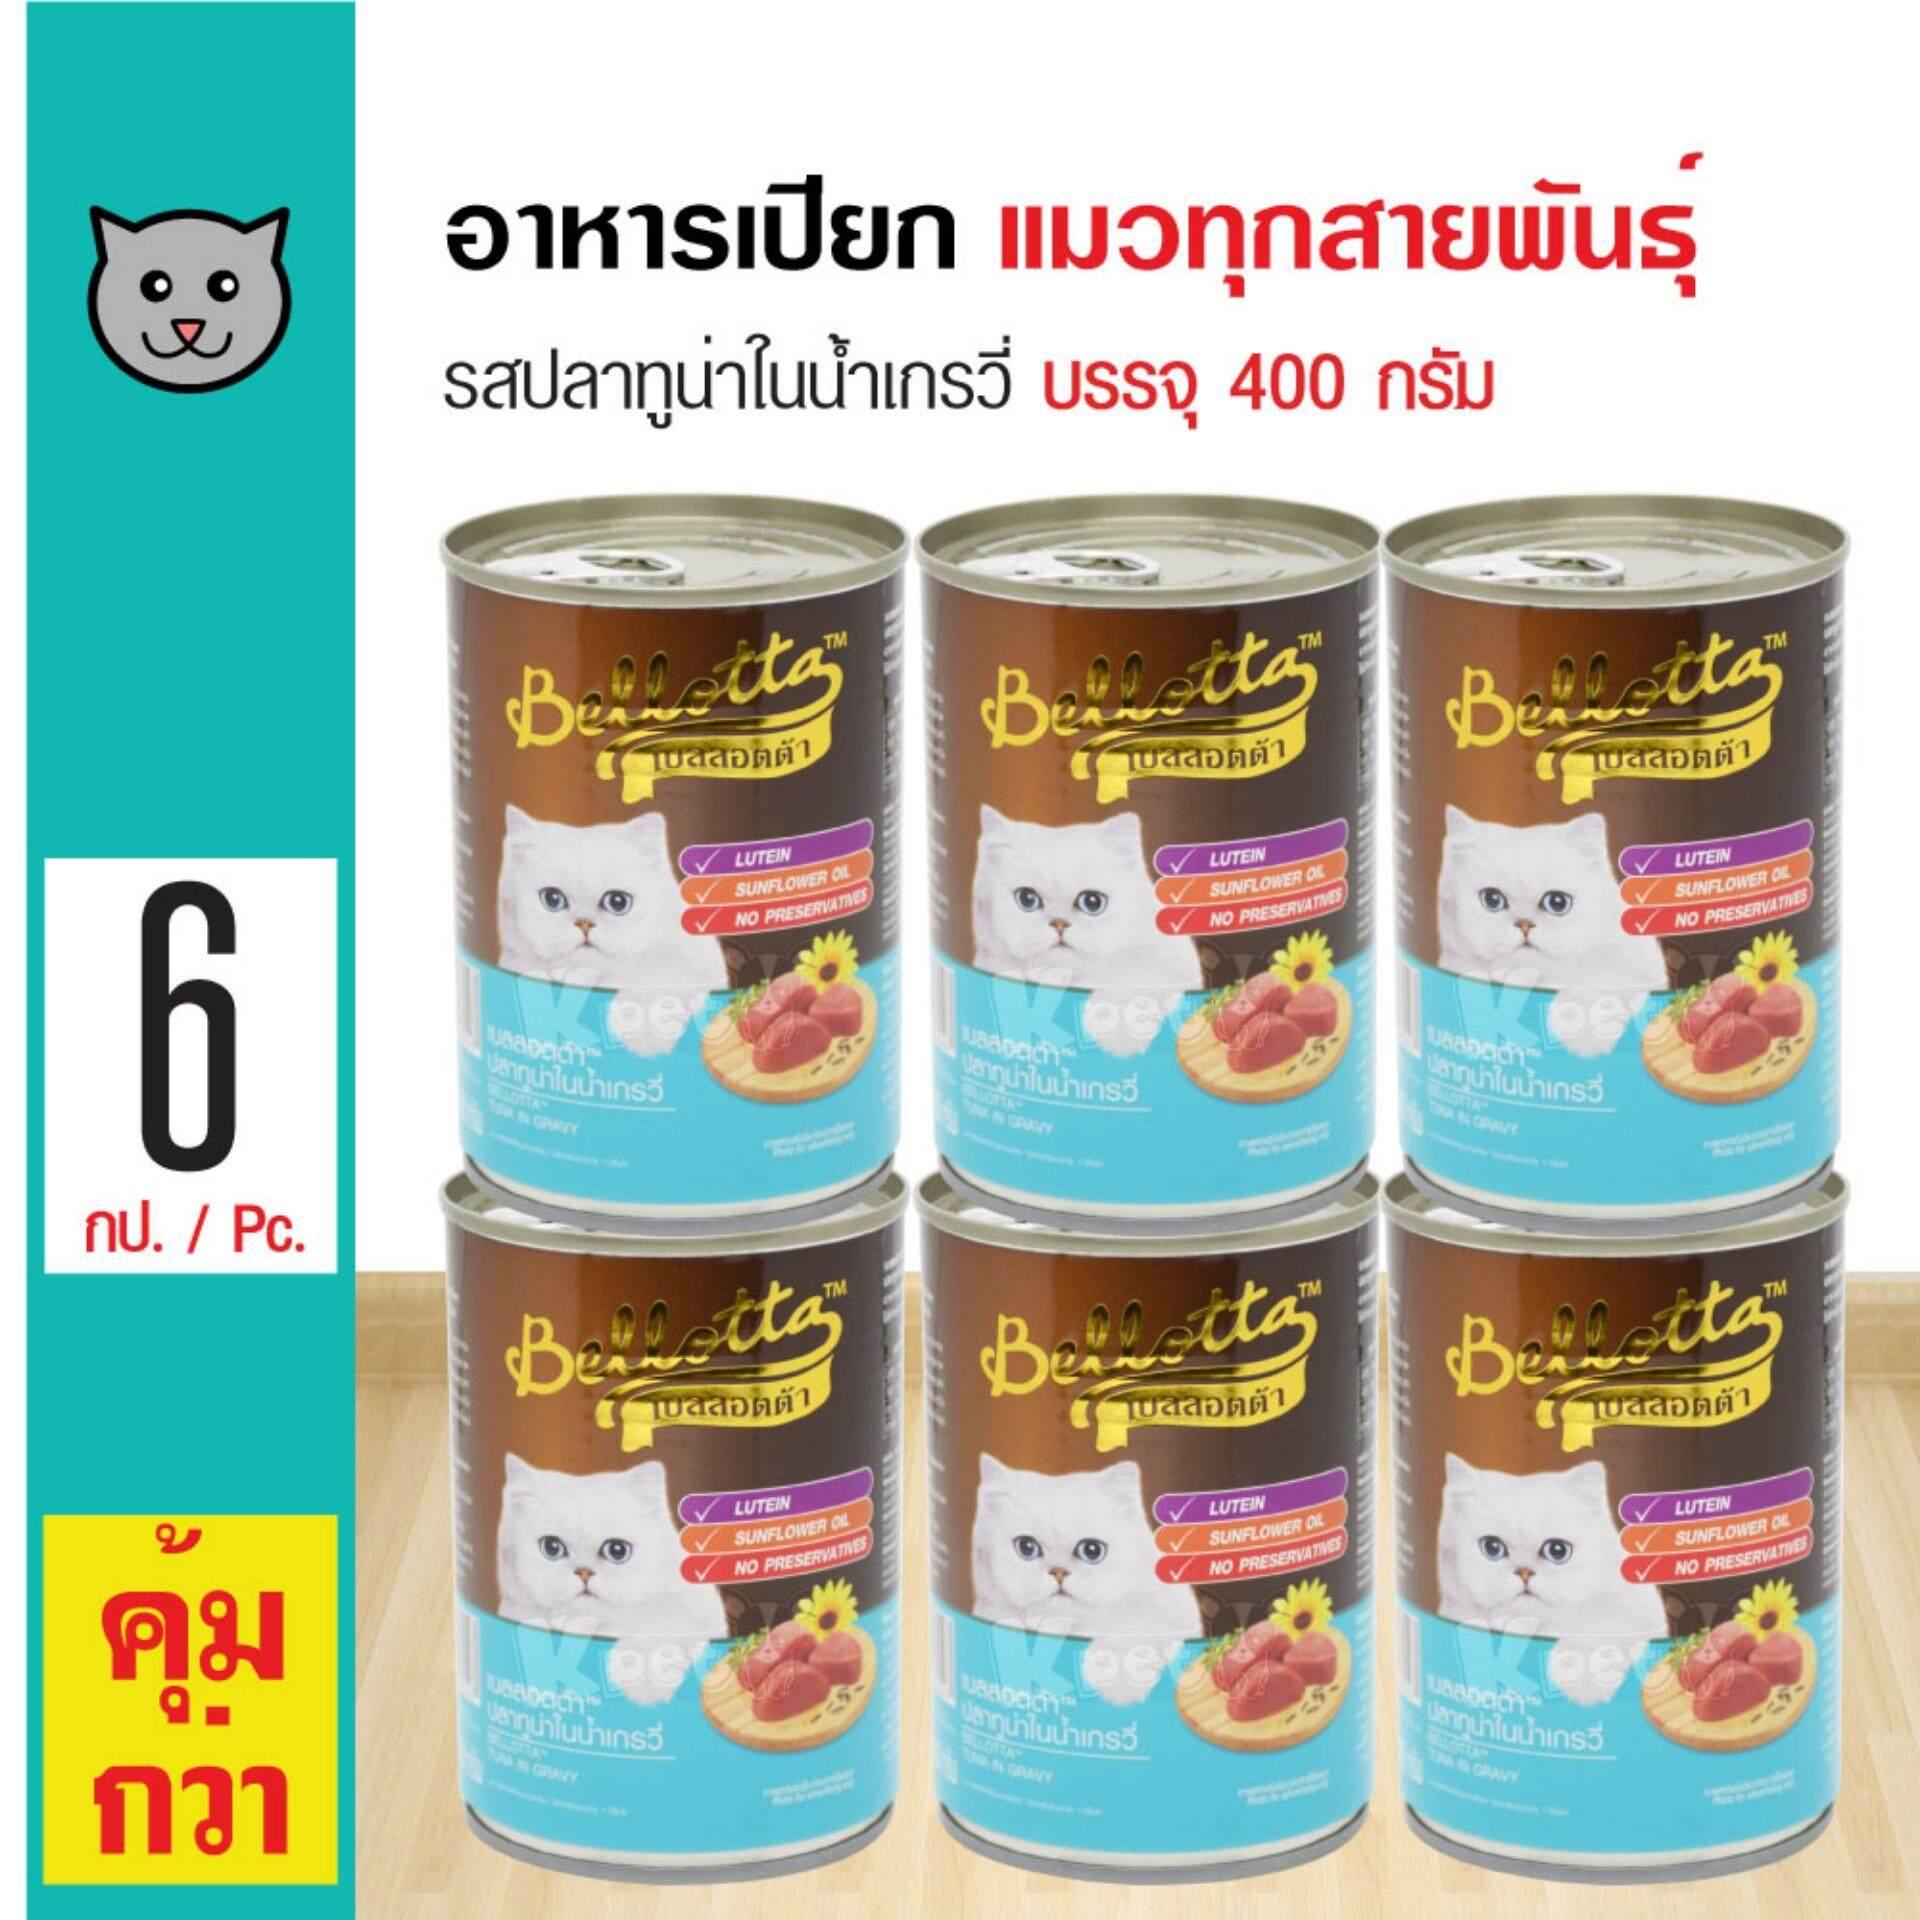 Bellotta Tuna In Gravy อาหารเปียก อาหารแมว รสปลาทูน่าในน้ำเกรวี่ สำหรับแมวทุกสายพันธุ์ ขนาด 400 กรัม X 6 กระป๋อง By Kpet.